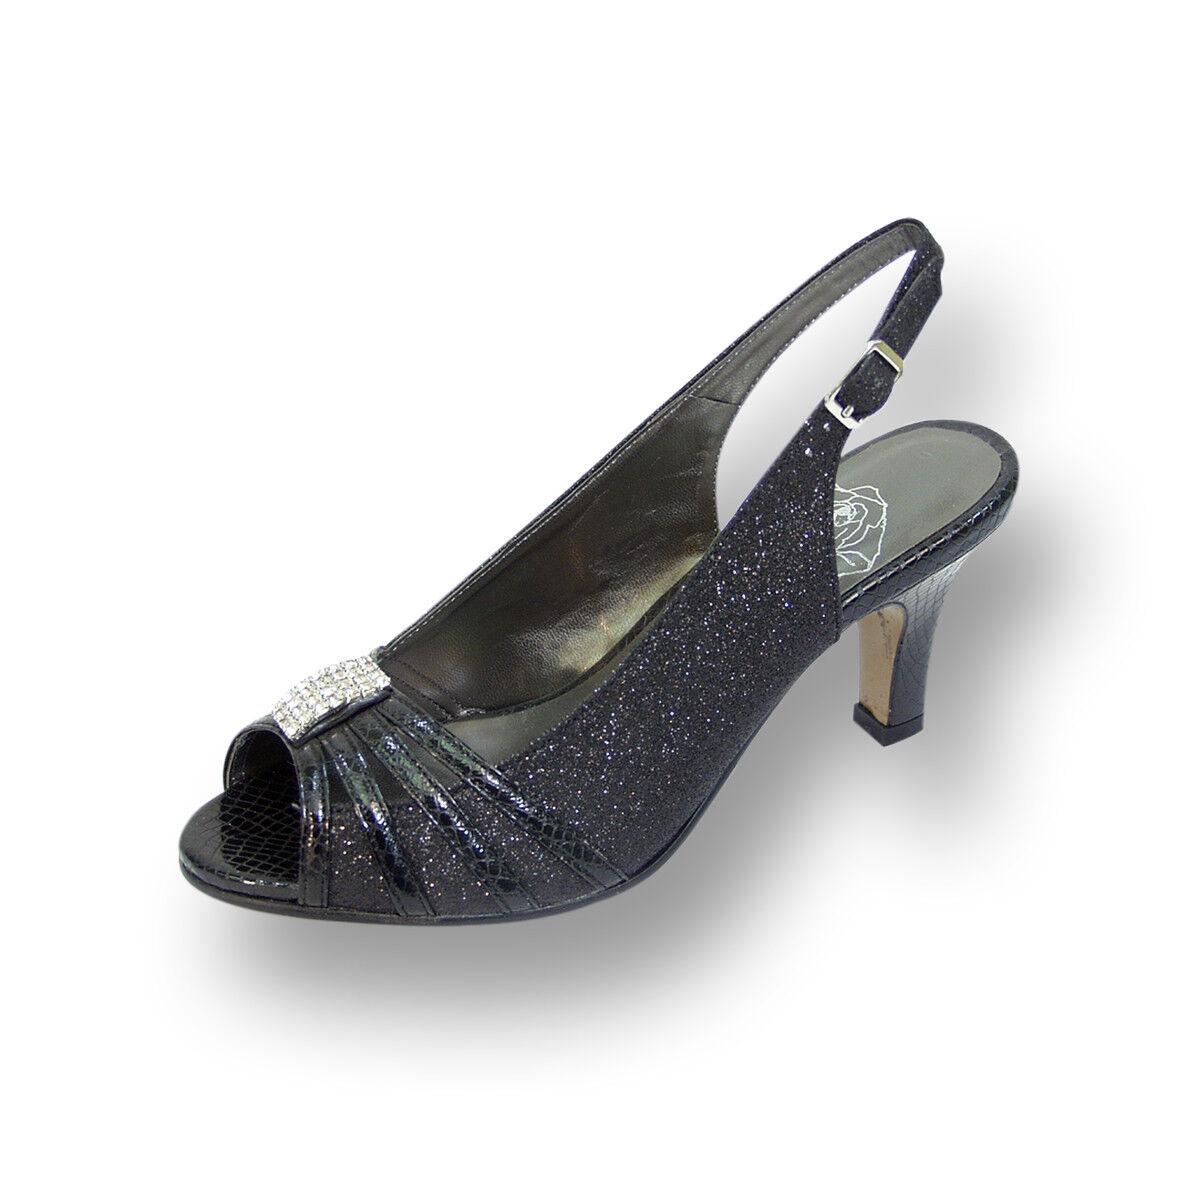 FIC FLORAL Teri Damens Wide Width Open Toe Decorative Jewel and Glitter Slingback